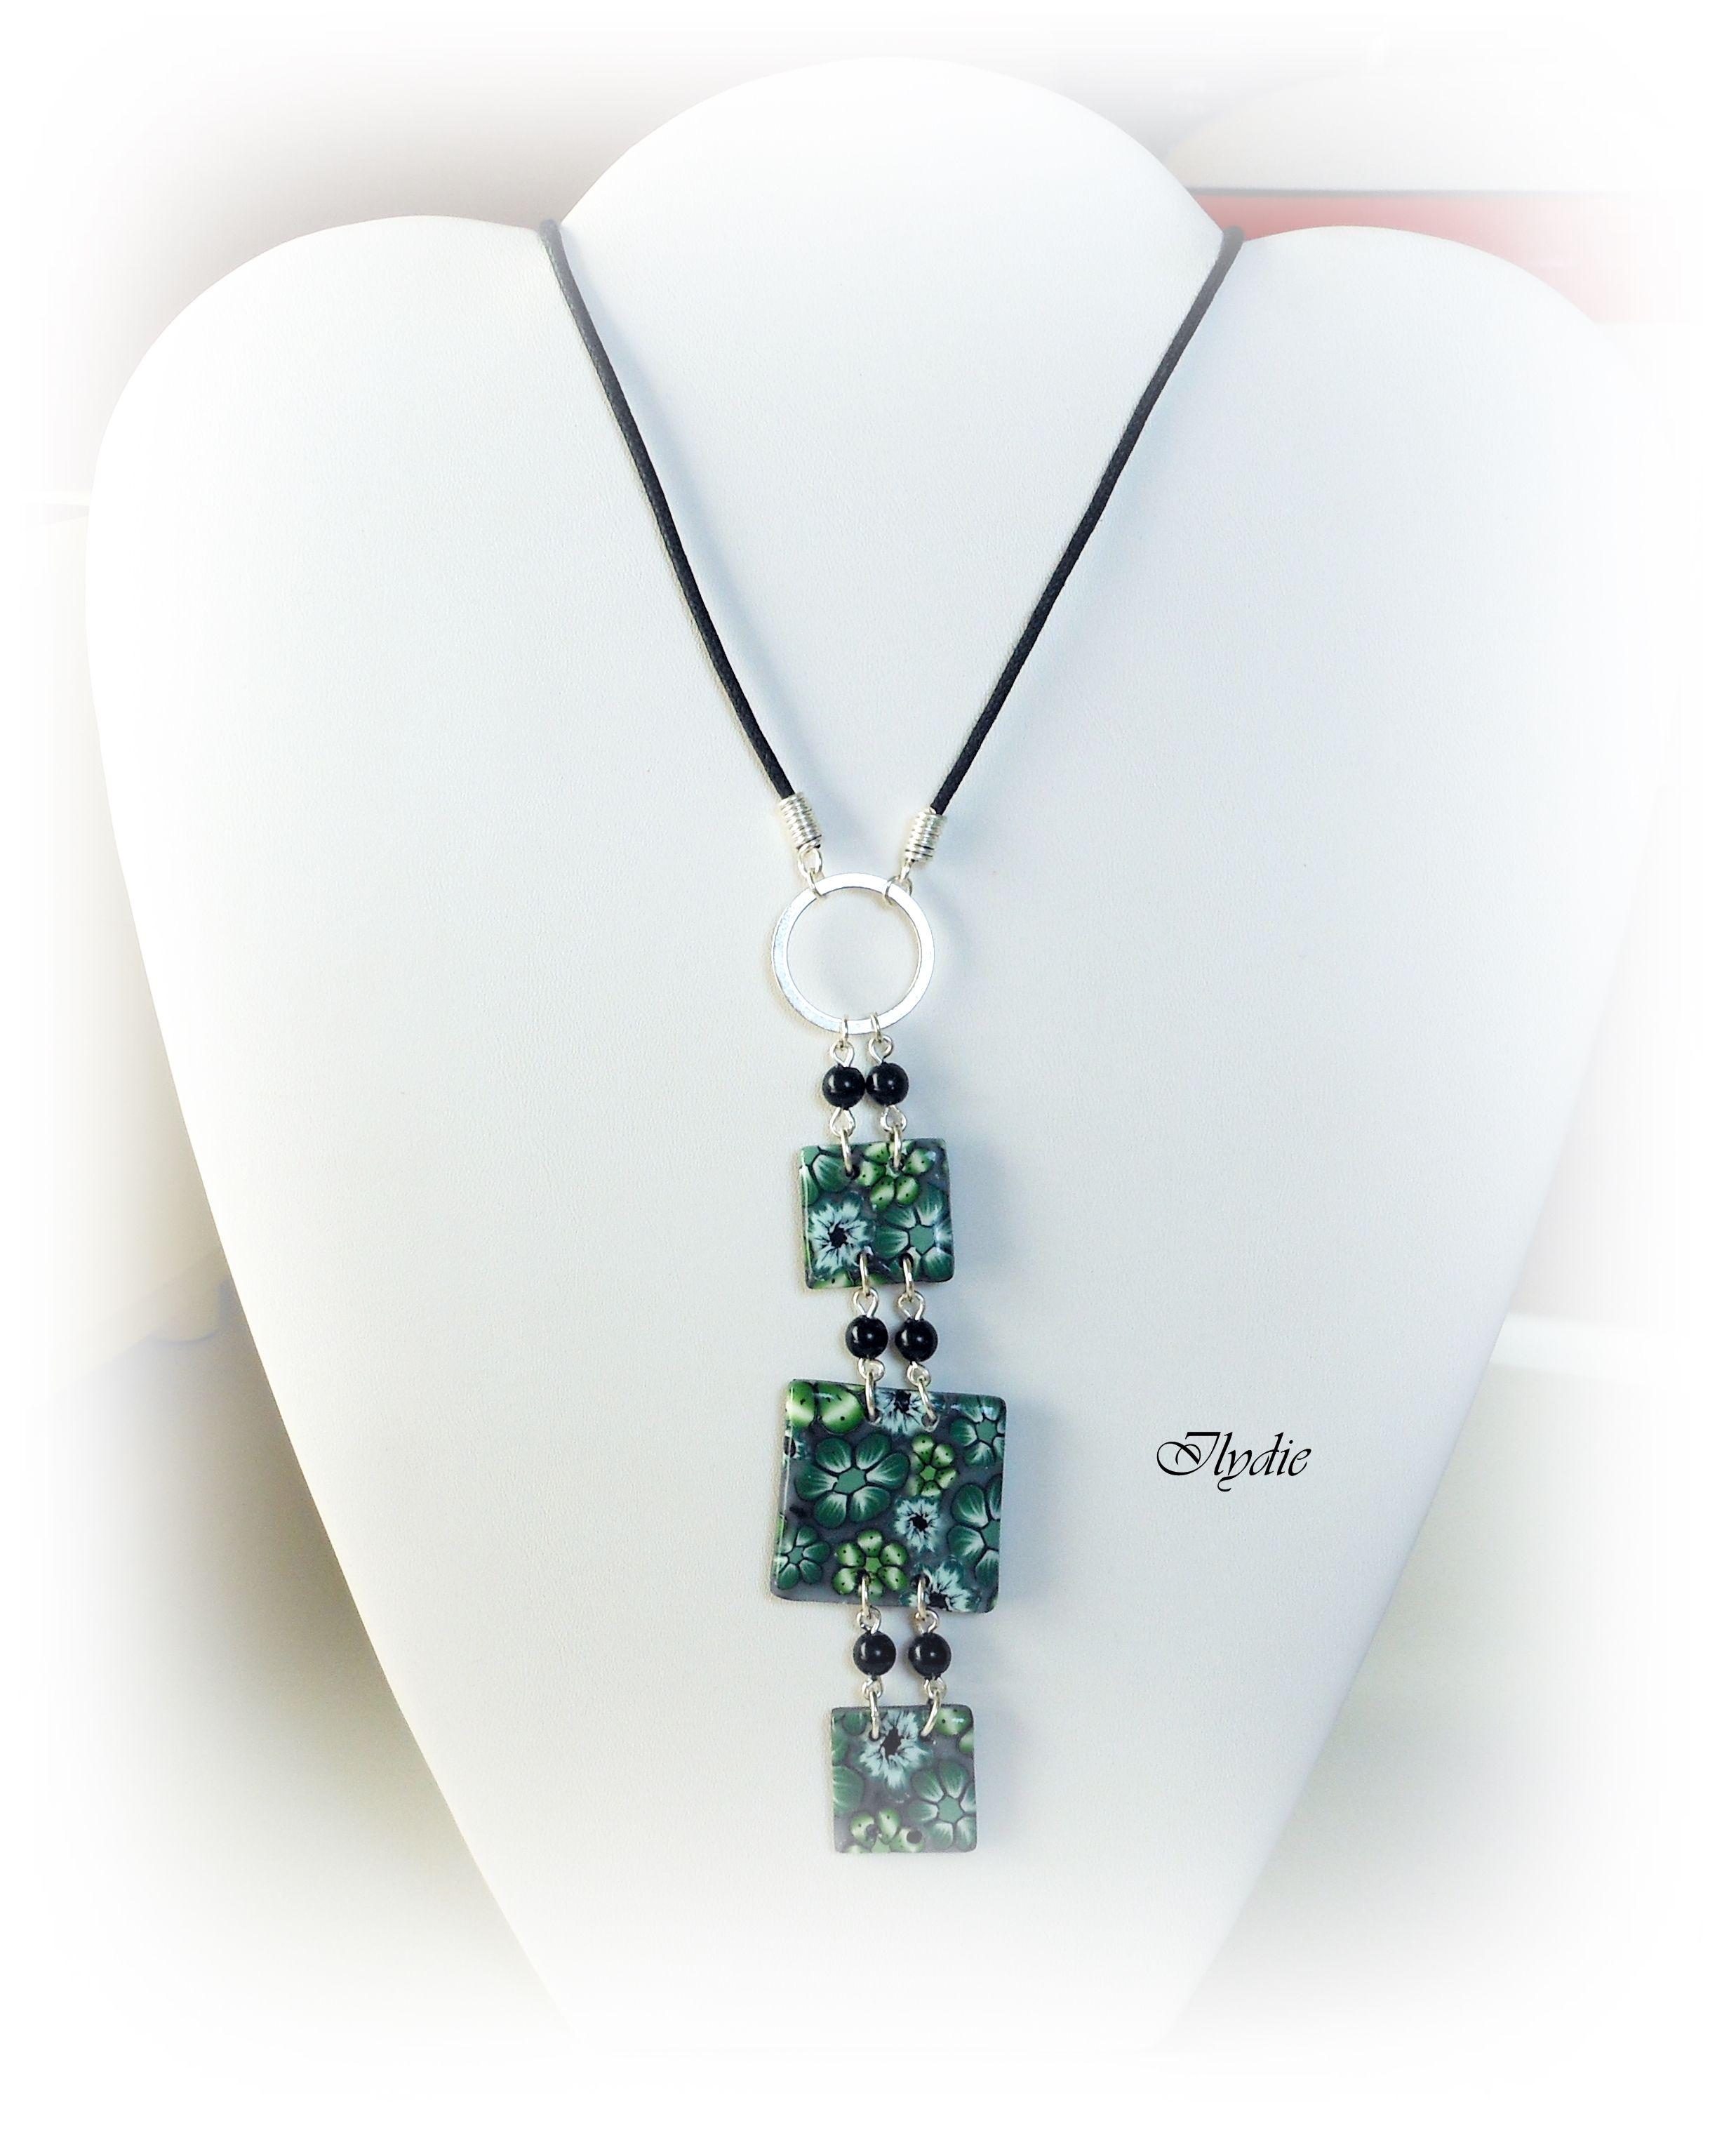 Pe27 (2013) Pendentif fleur cane fimo vert | Bijoux mode, Pendentif, Bijoux